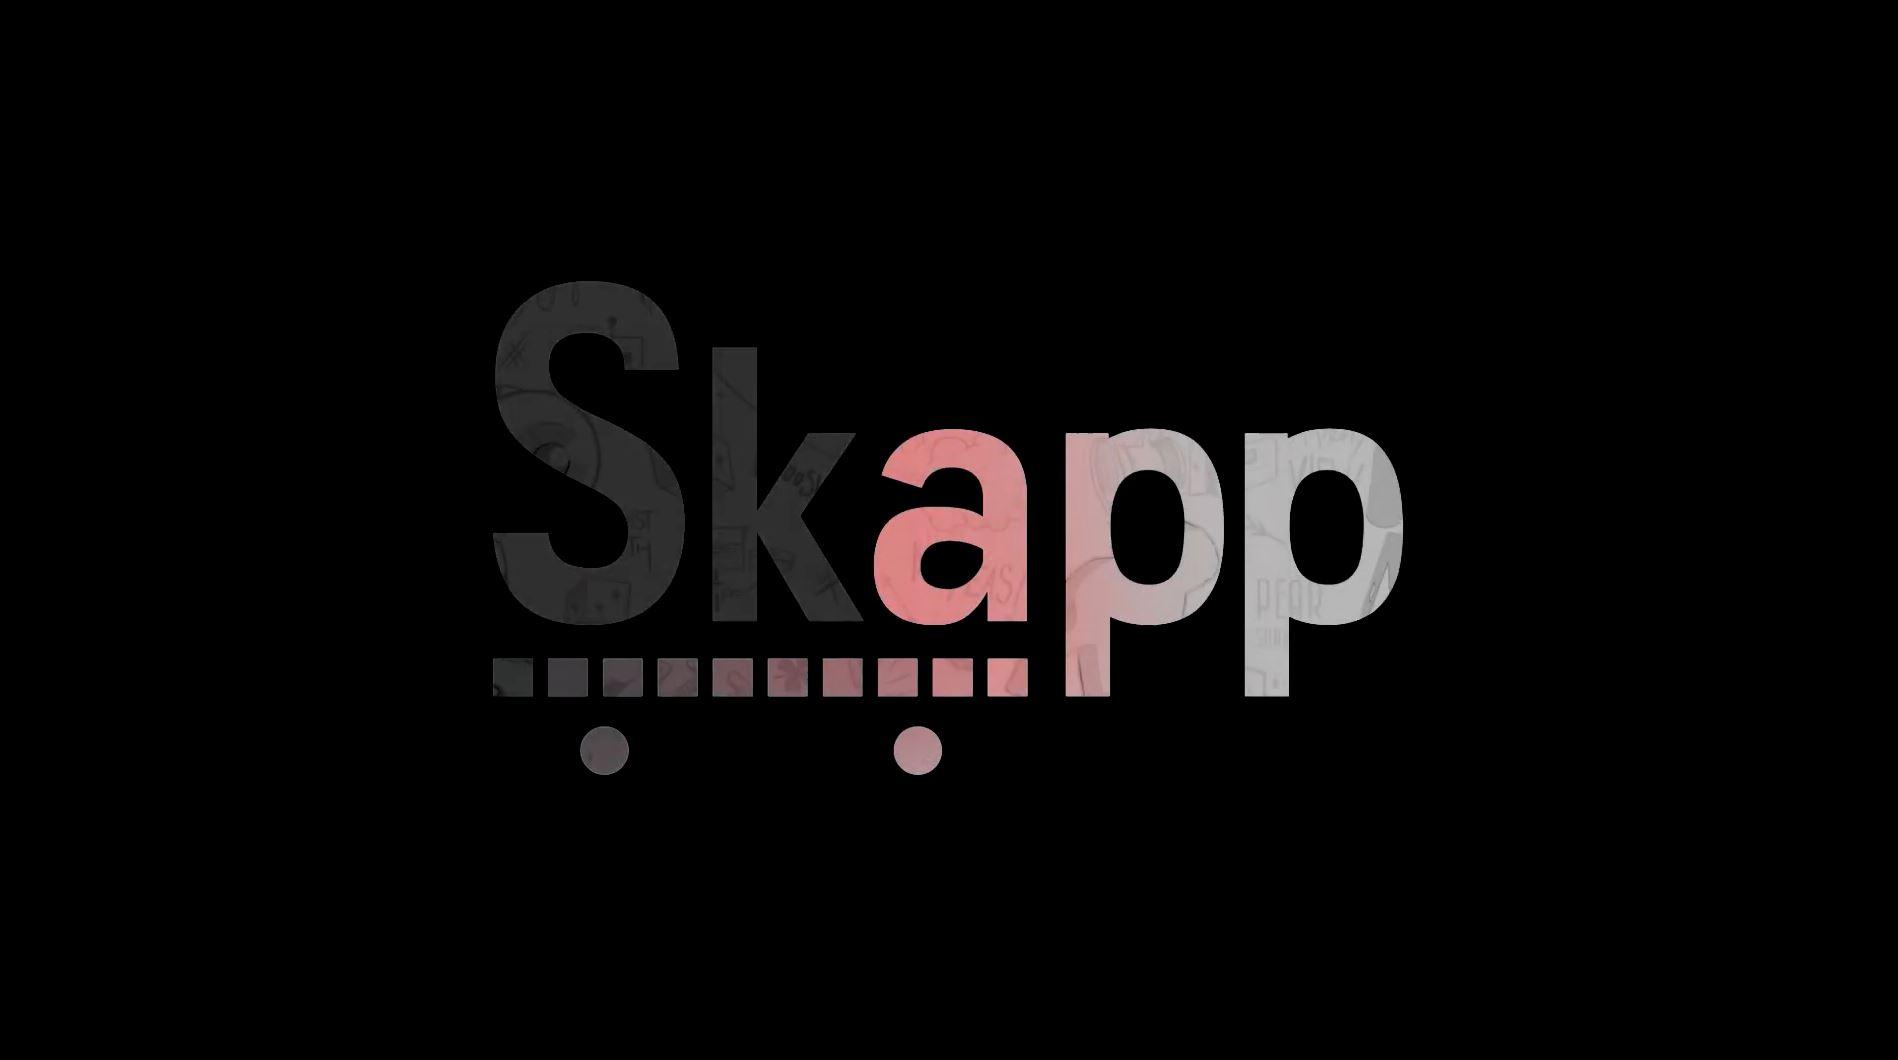 skapp-ps4-news-reviews-videos